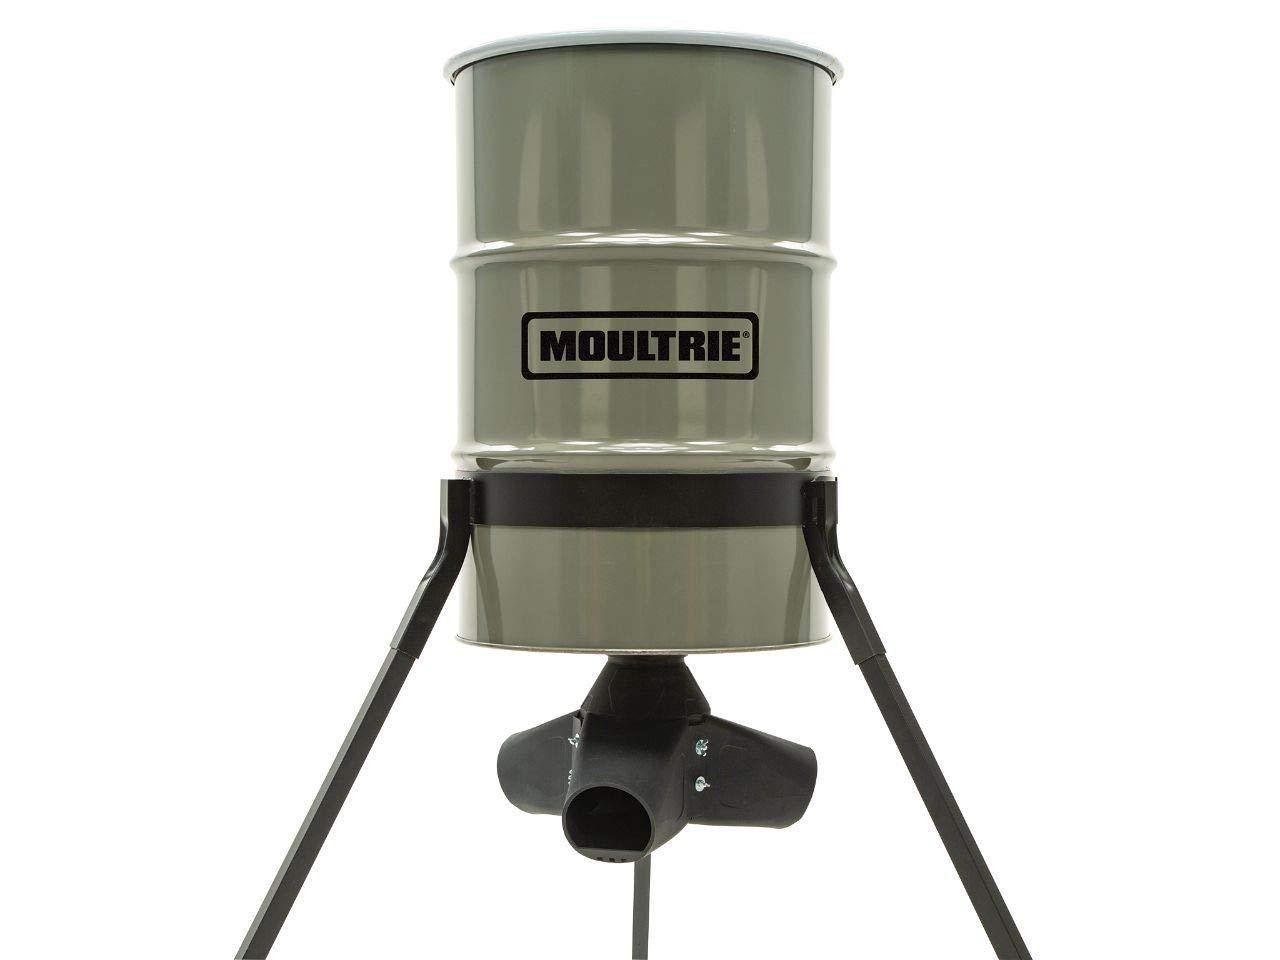 Moultrie 55-Gallon Gravity Tripod Feeder